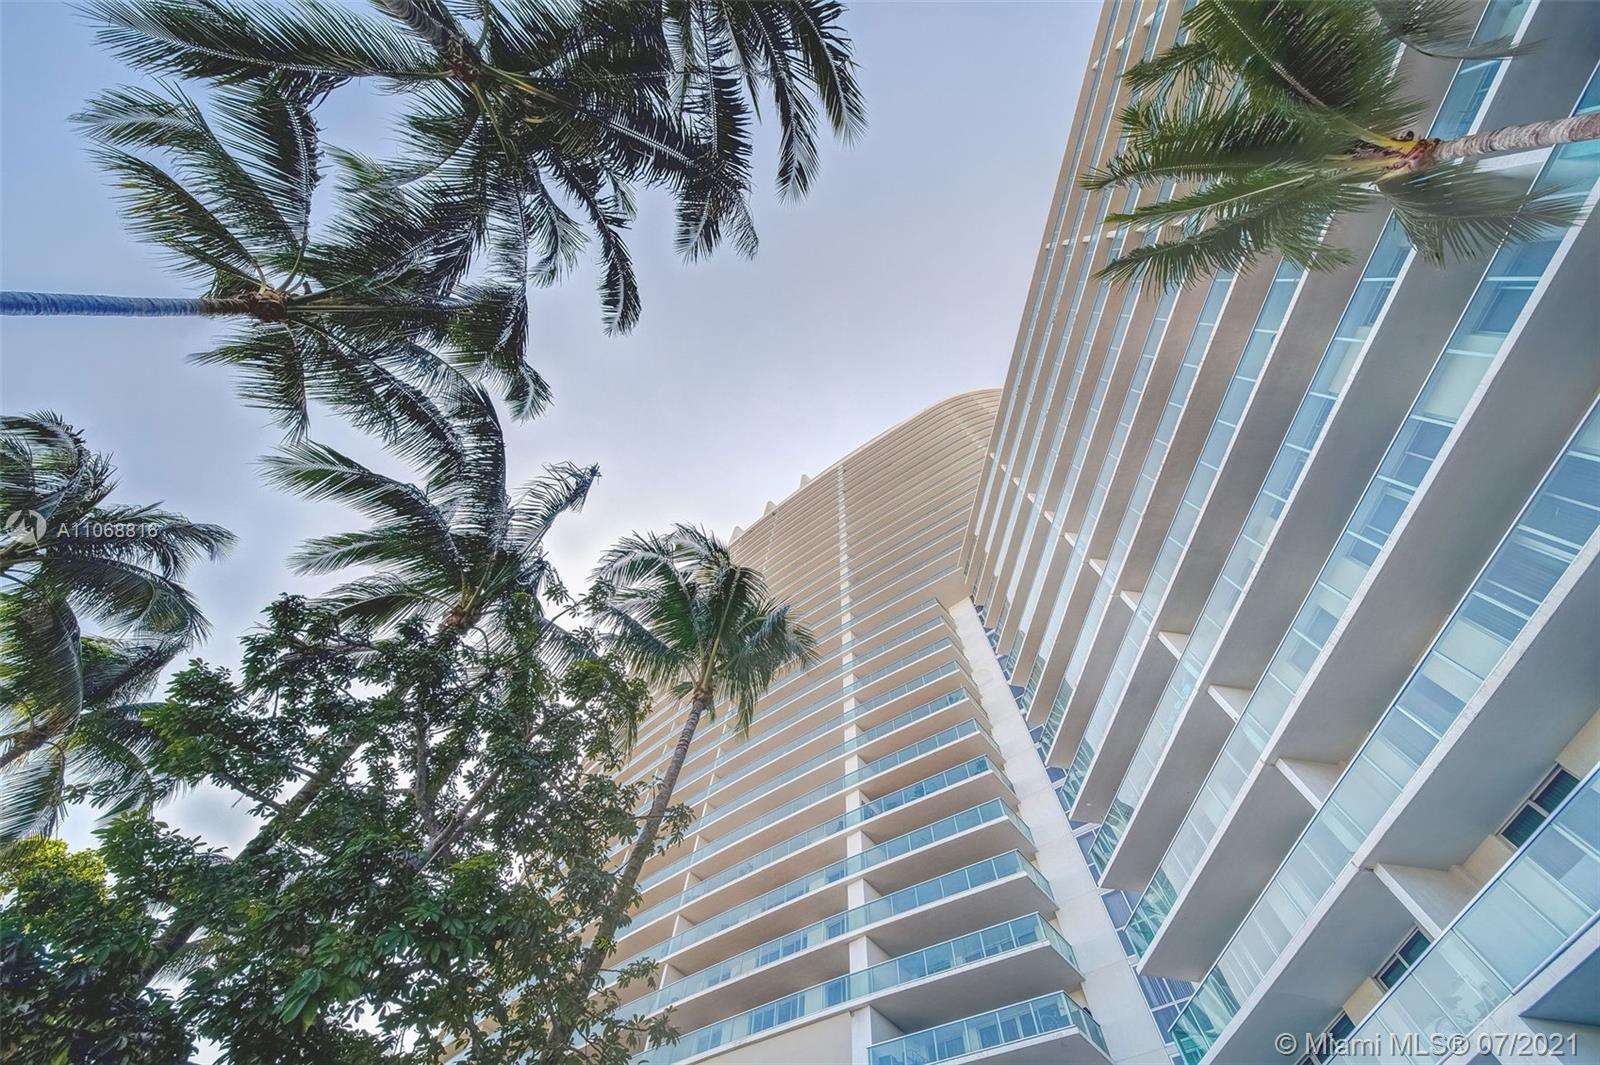 Flamingo South Beach #M-1023 - 50 - photo